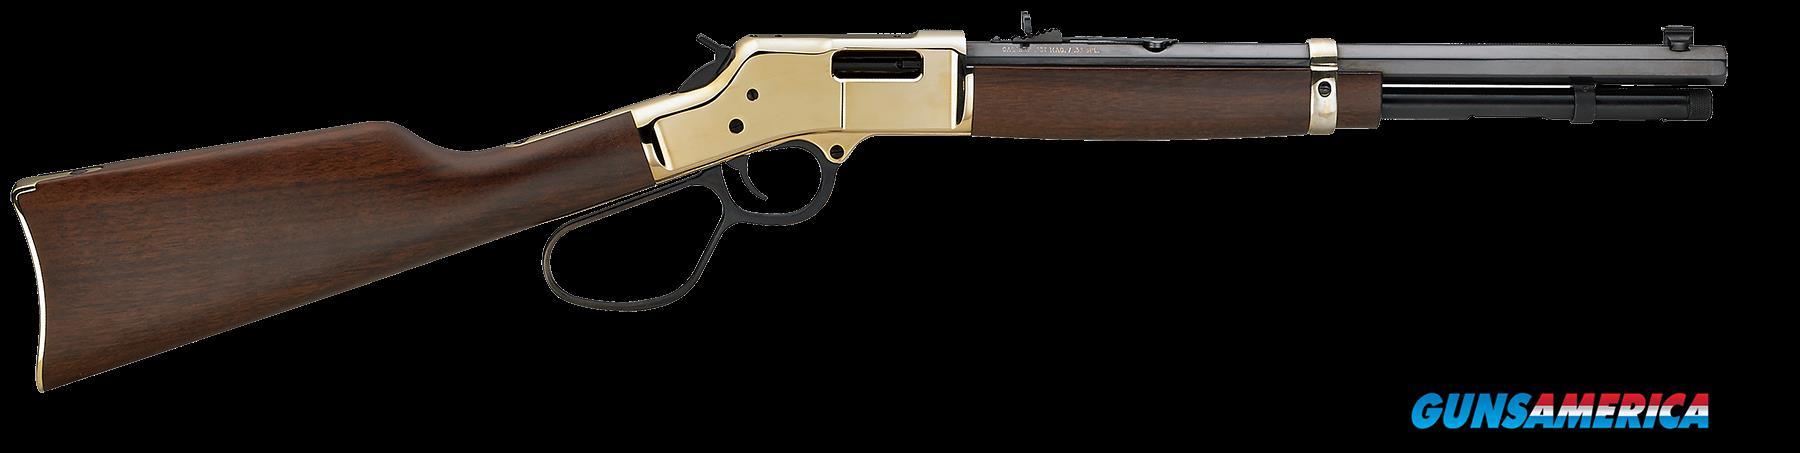 Henry Big Boy, Henry H006mr327 Big Boy Carb 327fedmag  Guns > Pistols > 1911 Pistol Copies (non-Colt)